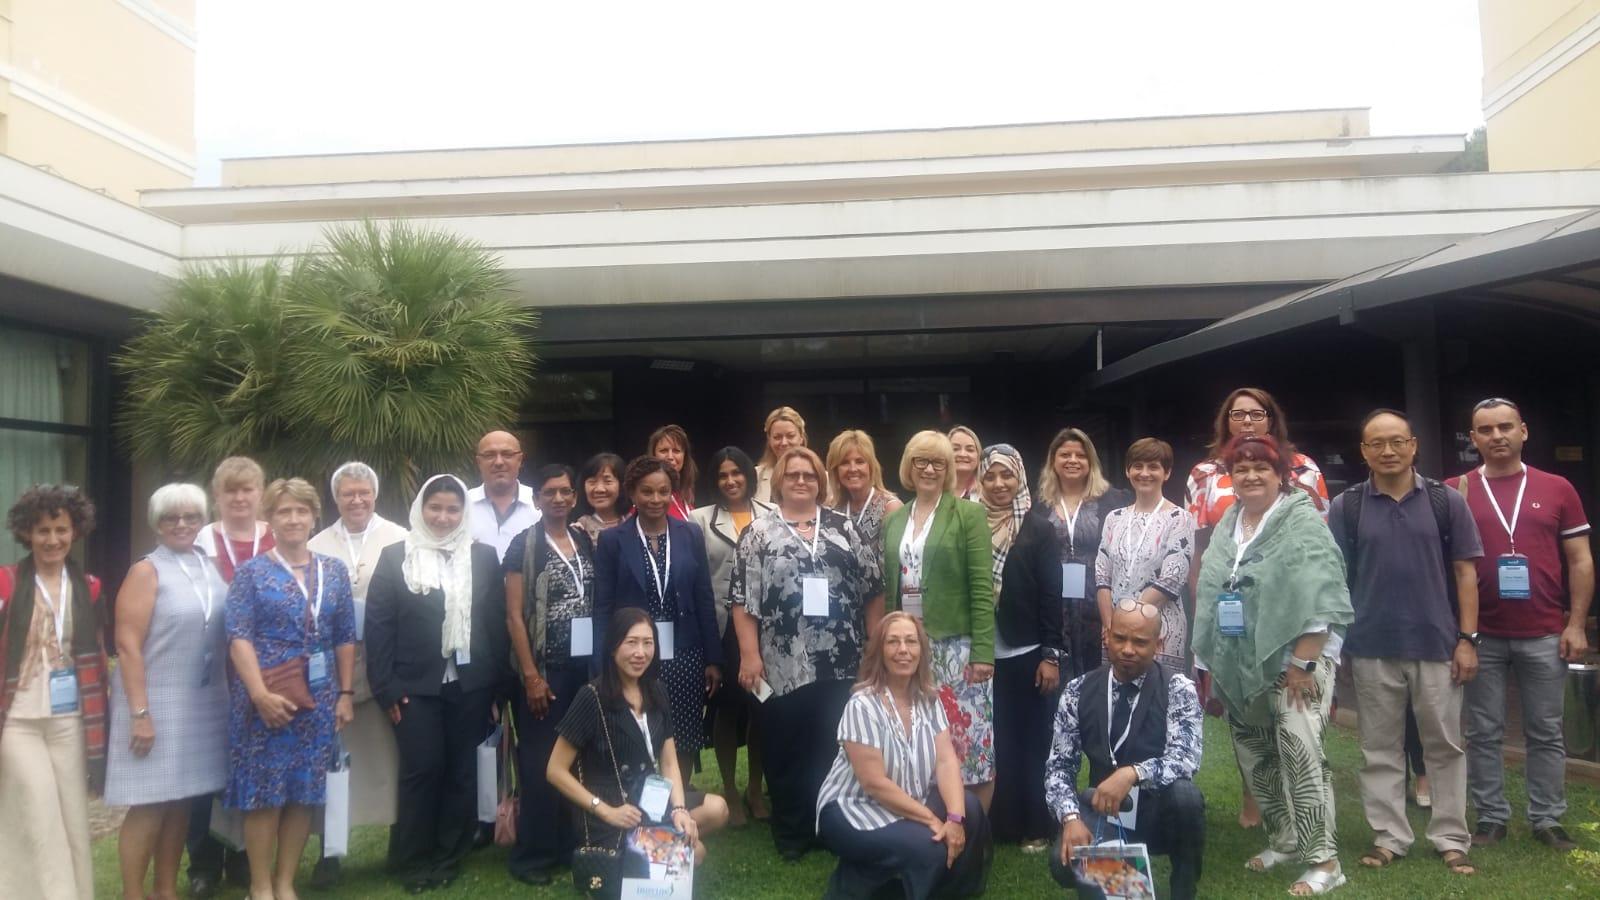 World Congress on Nursing & Healthcare